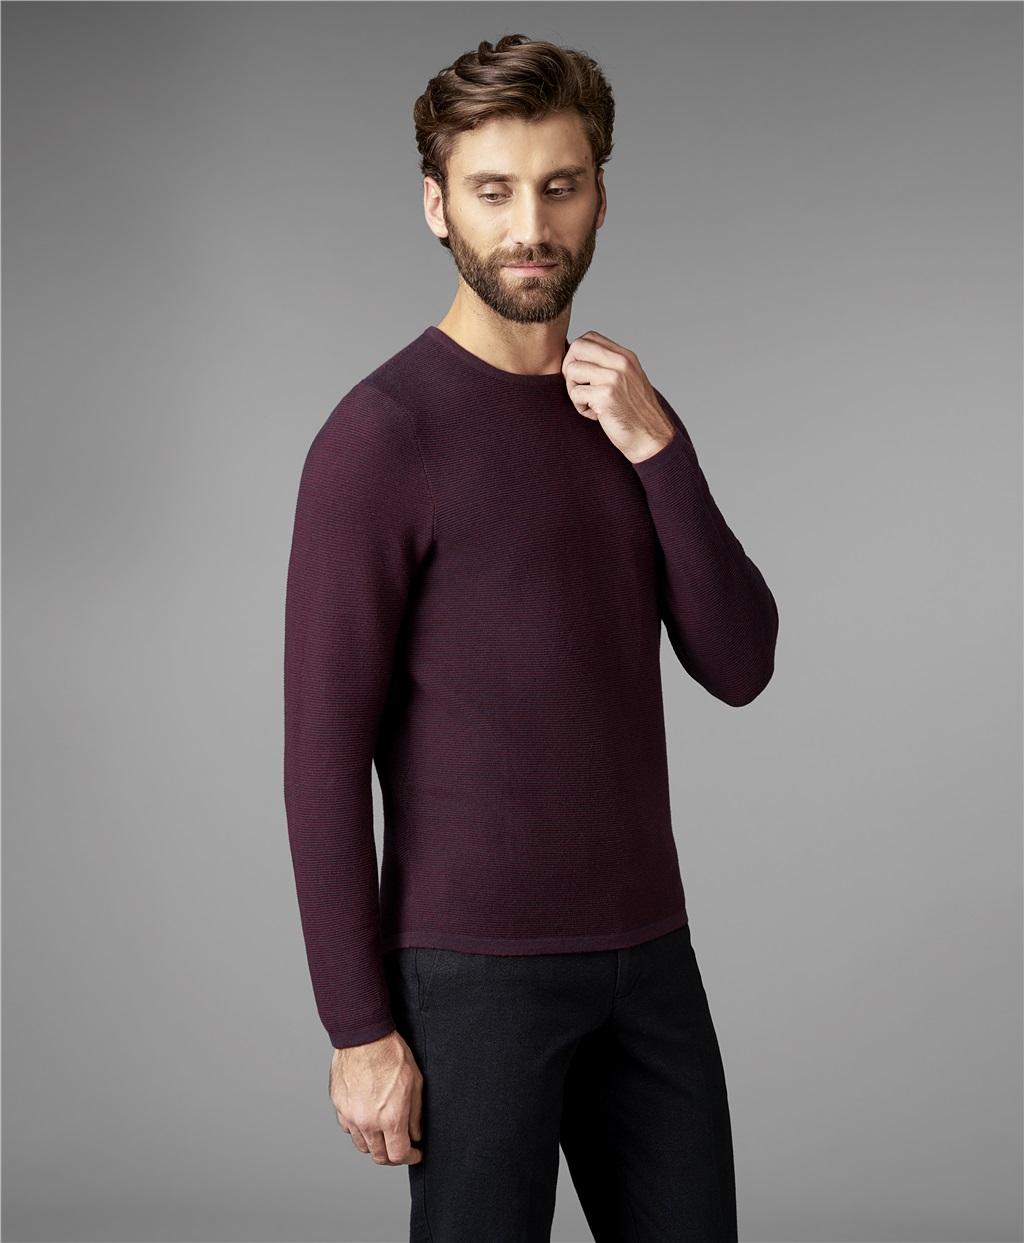 Пуловер трикотажный HENDERSON KWL-0685 BORDO фото